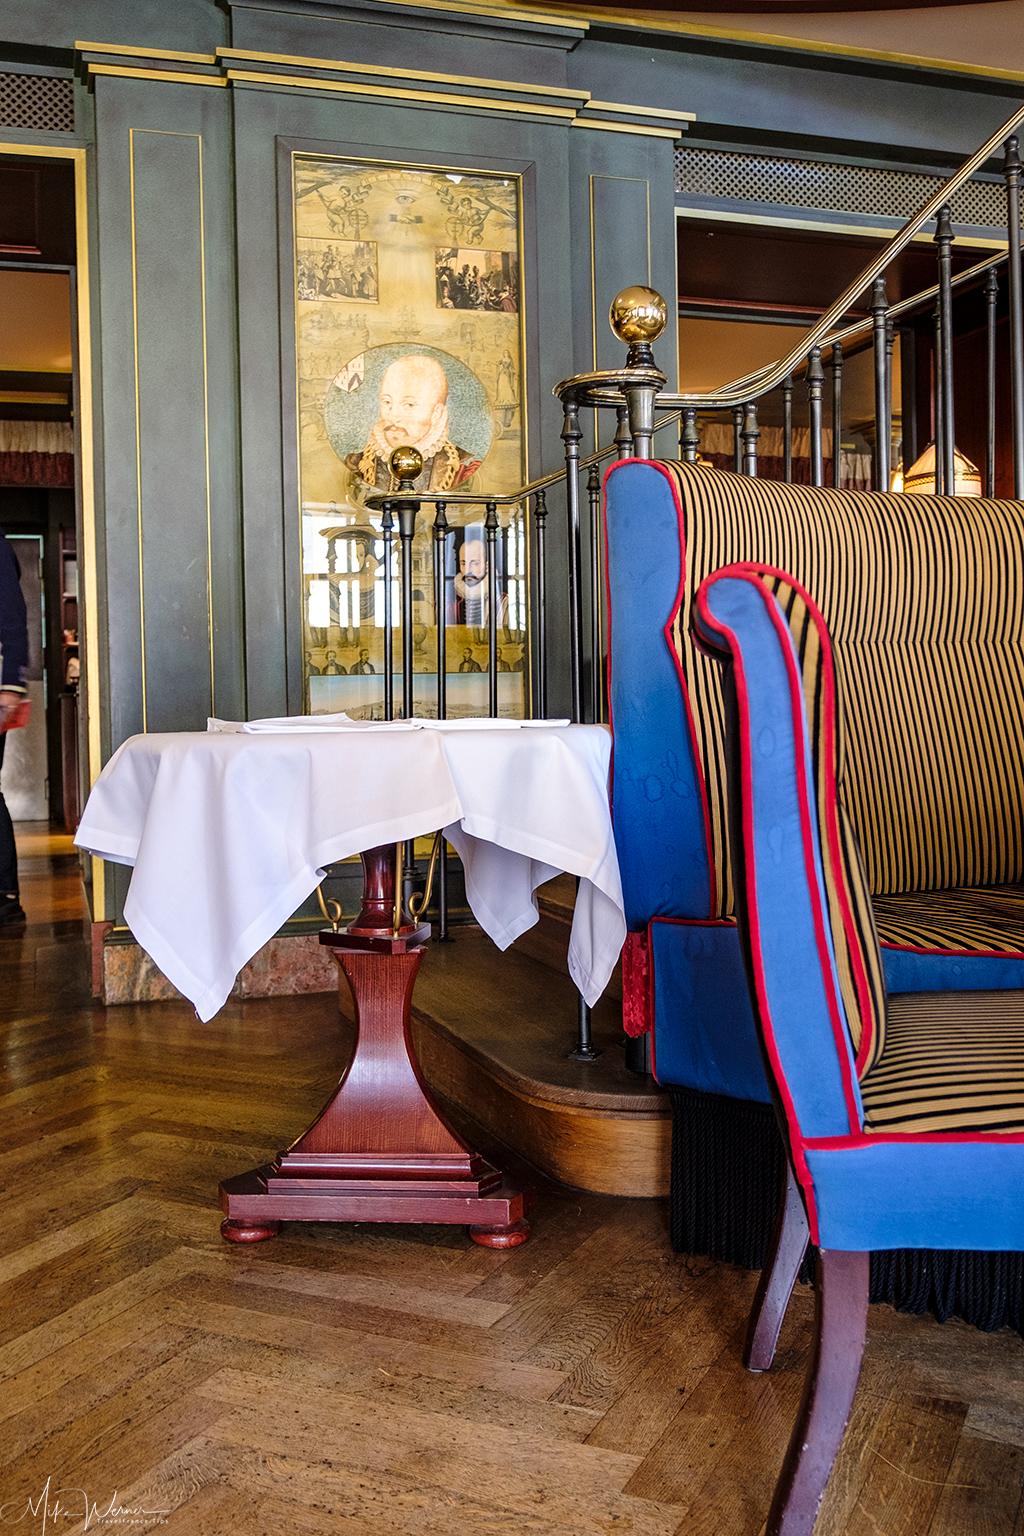 Decor of the 'Le Bordeaux' restaurant of Gordon Ramsay